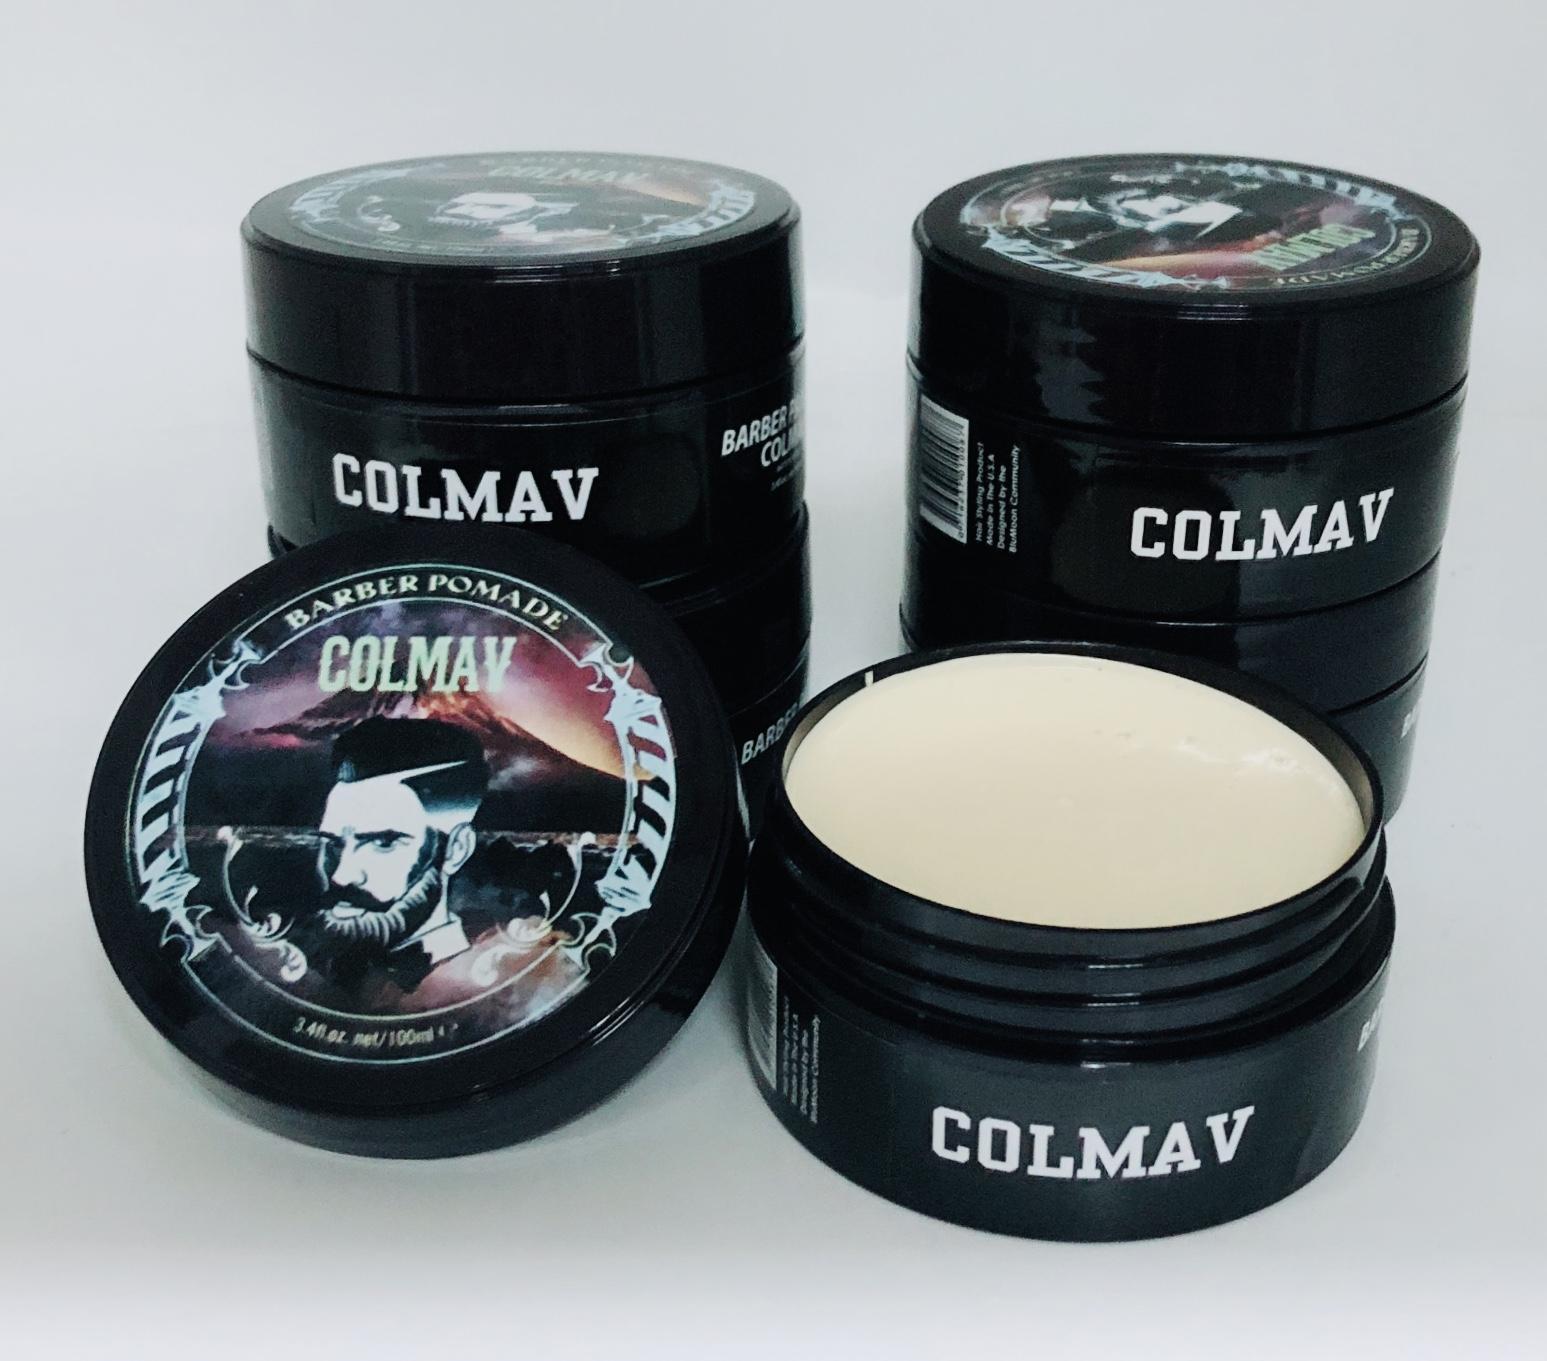 Sáp Vuốt Tóc Nam wax tóc nam Colmav Barber Pomade 100ml